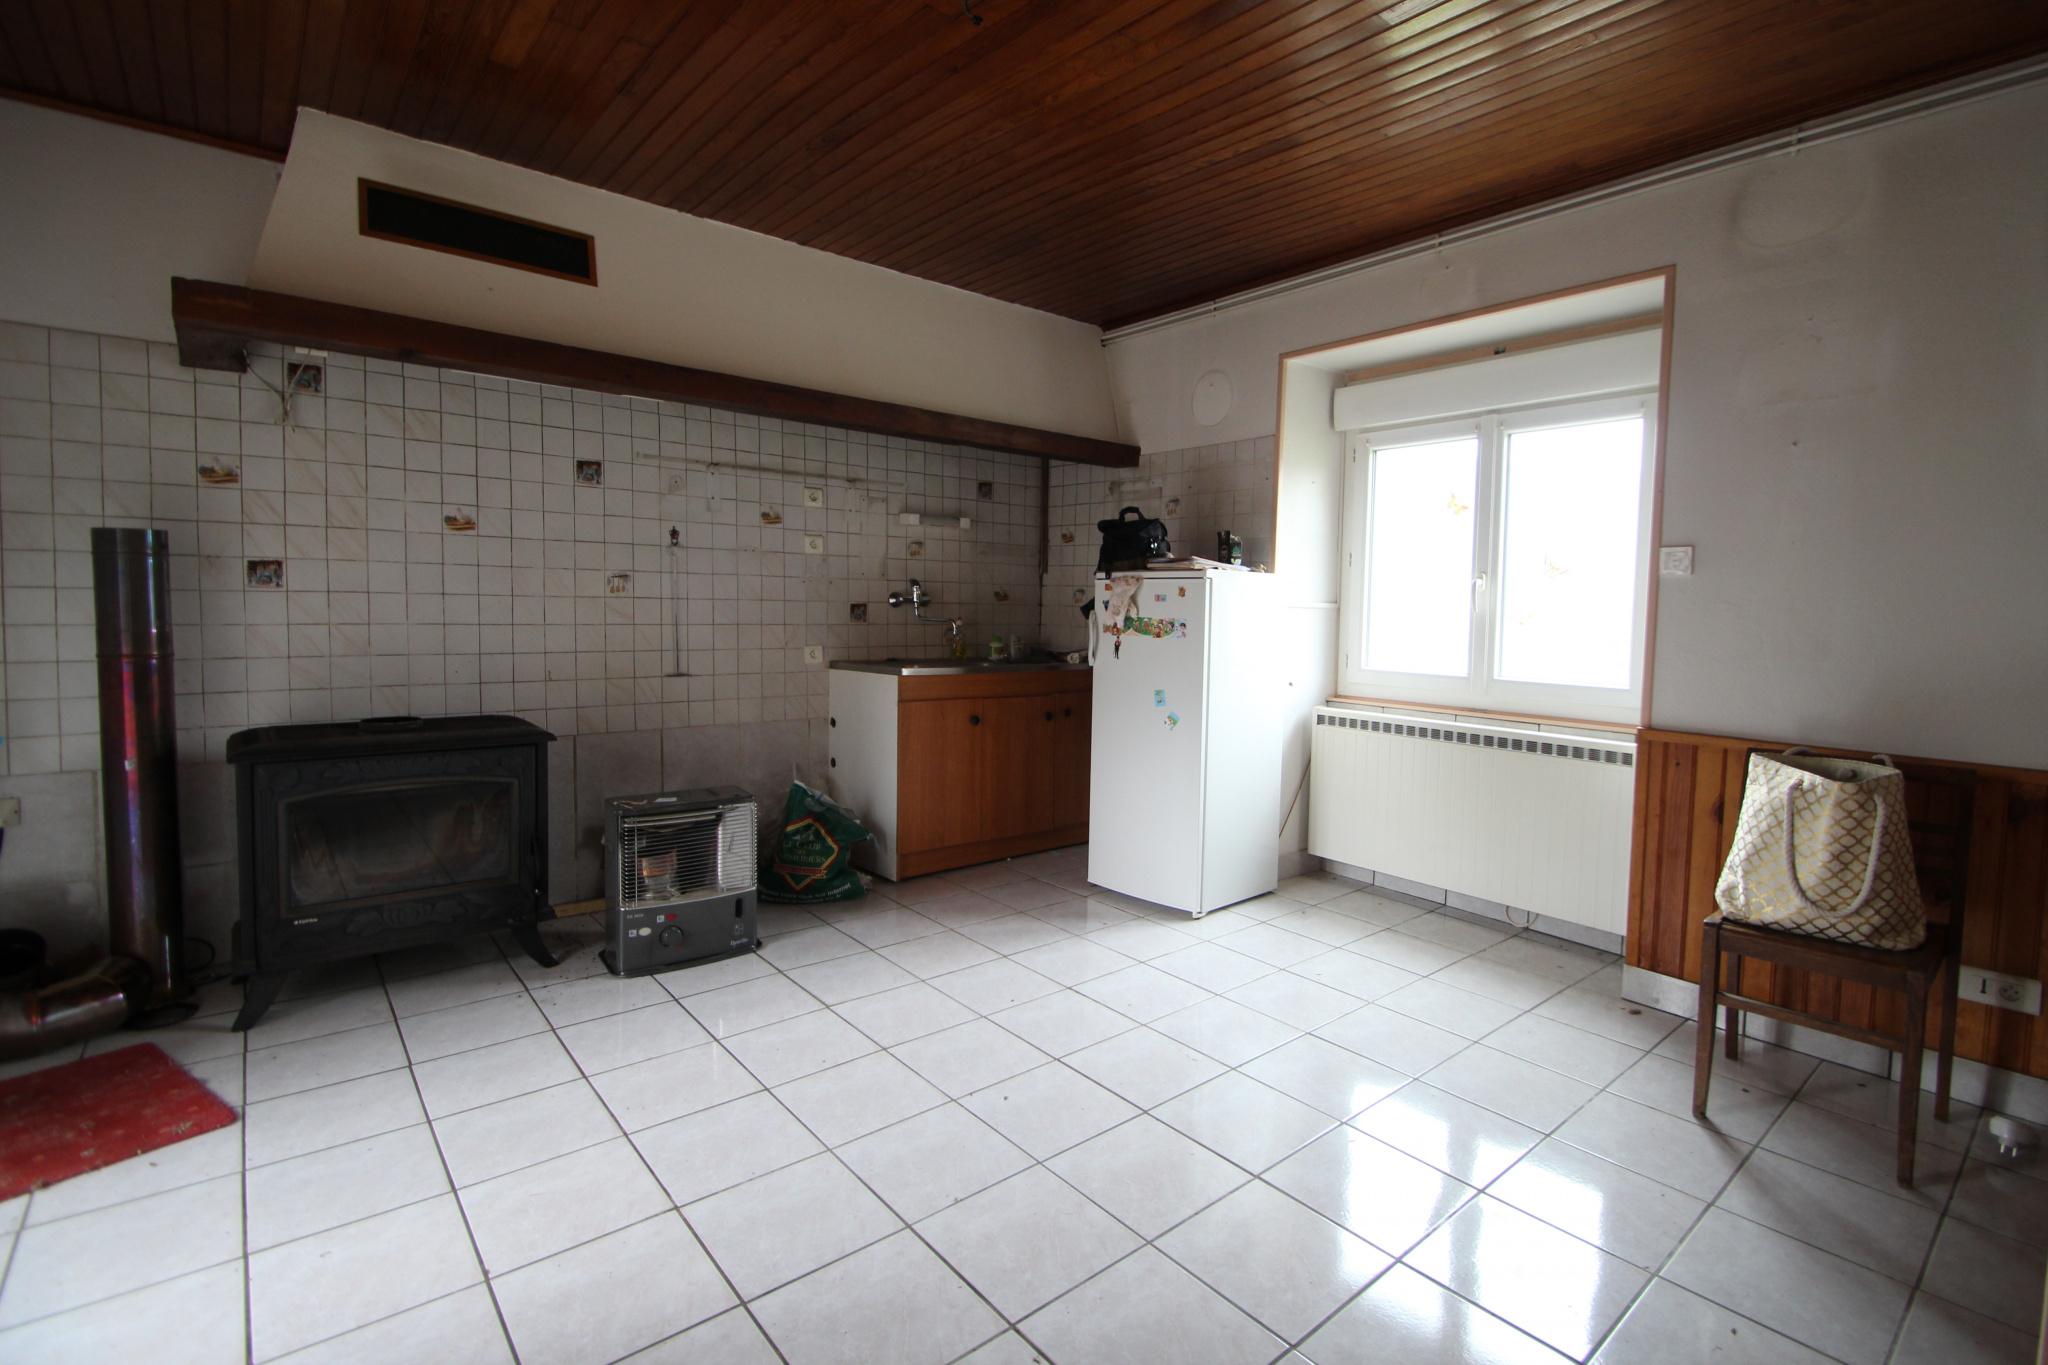 Vente maison/villa bligny sur ouche transco